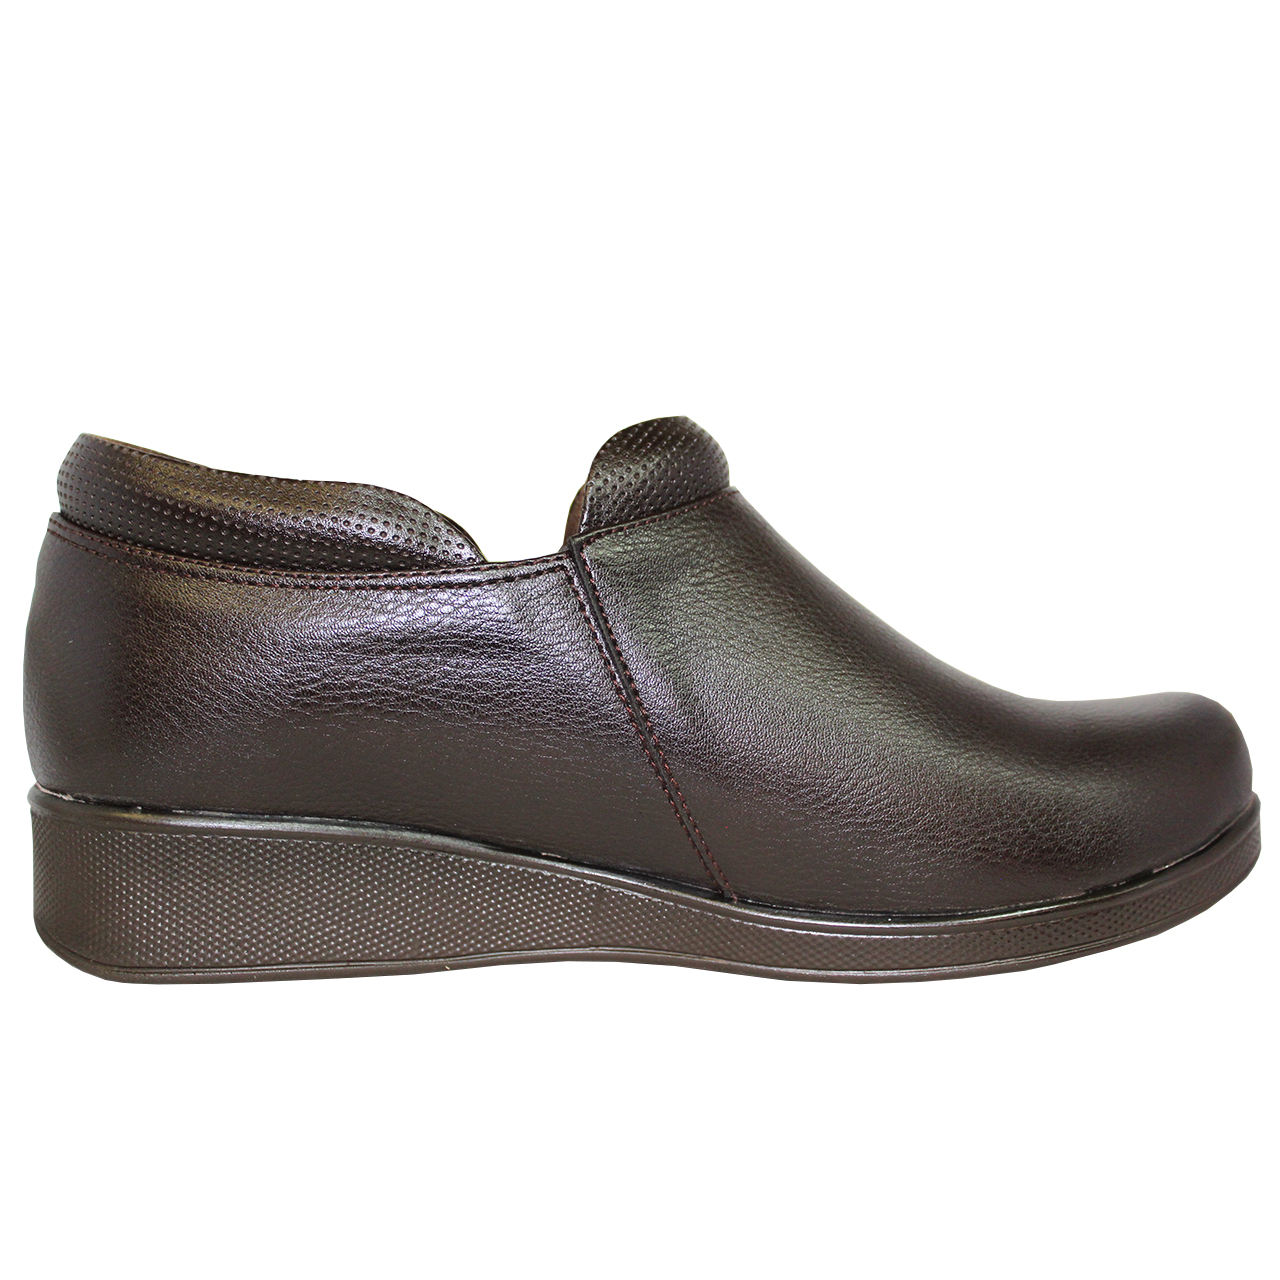 کفش روزمره زنانه لیانا کد 362-GH -  - 1